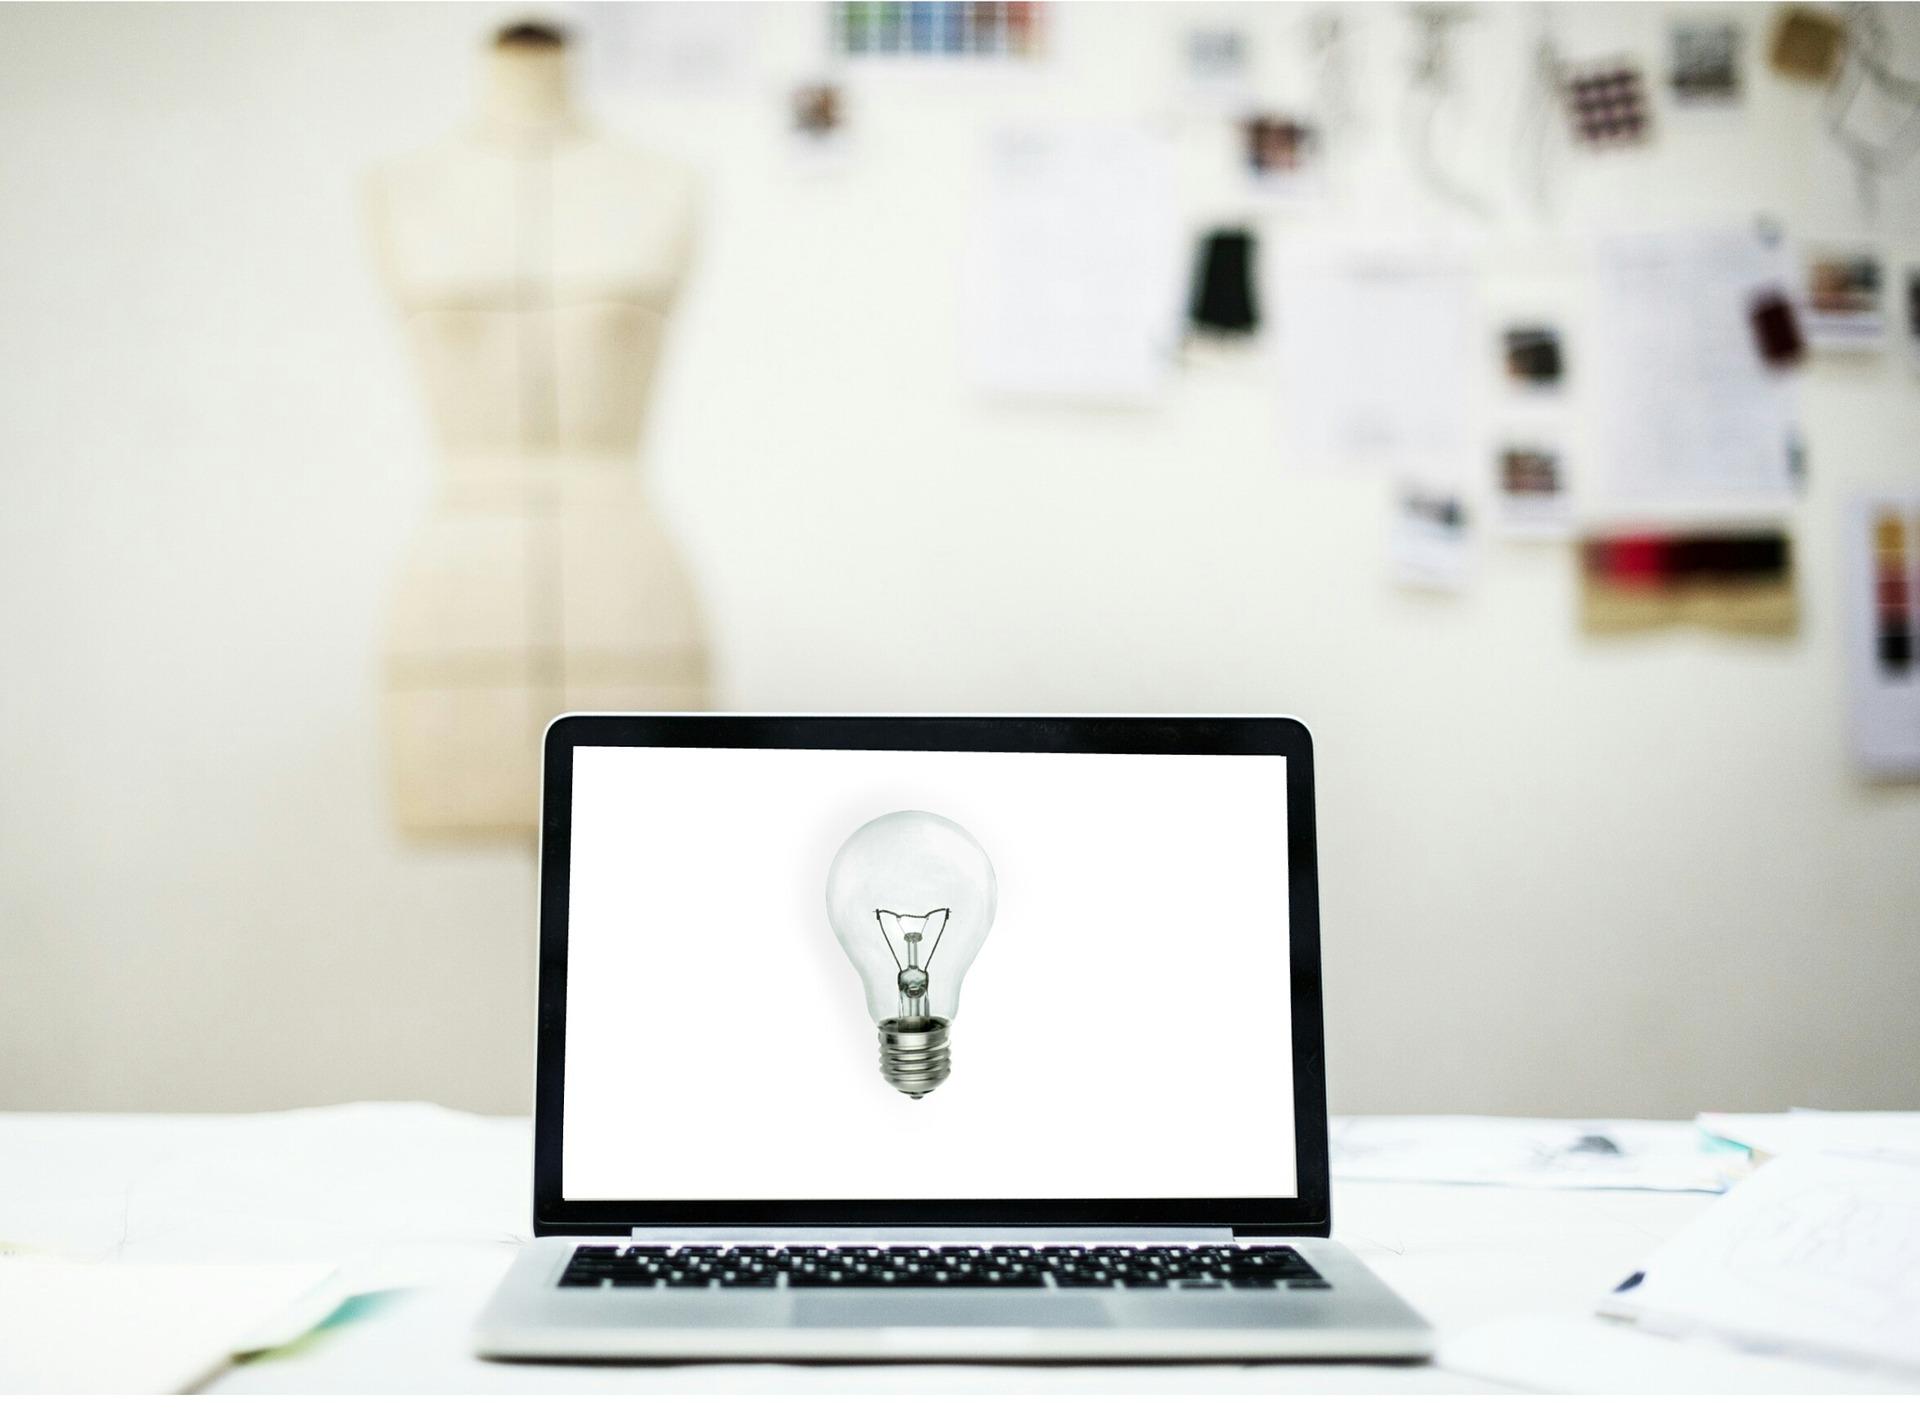 Web Design Competition Image